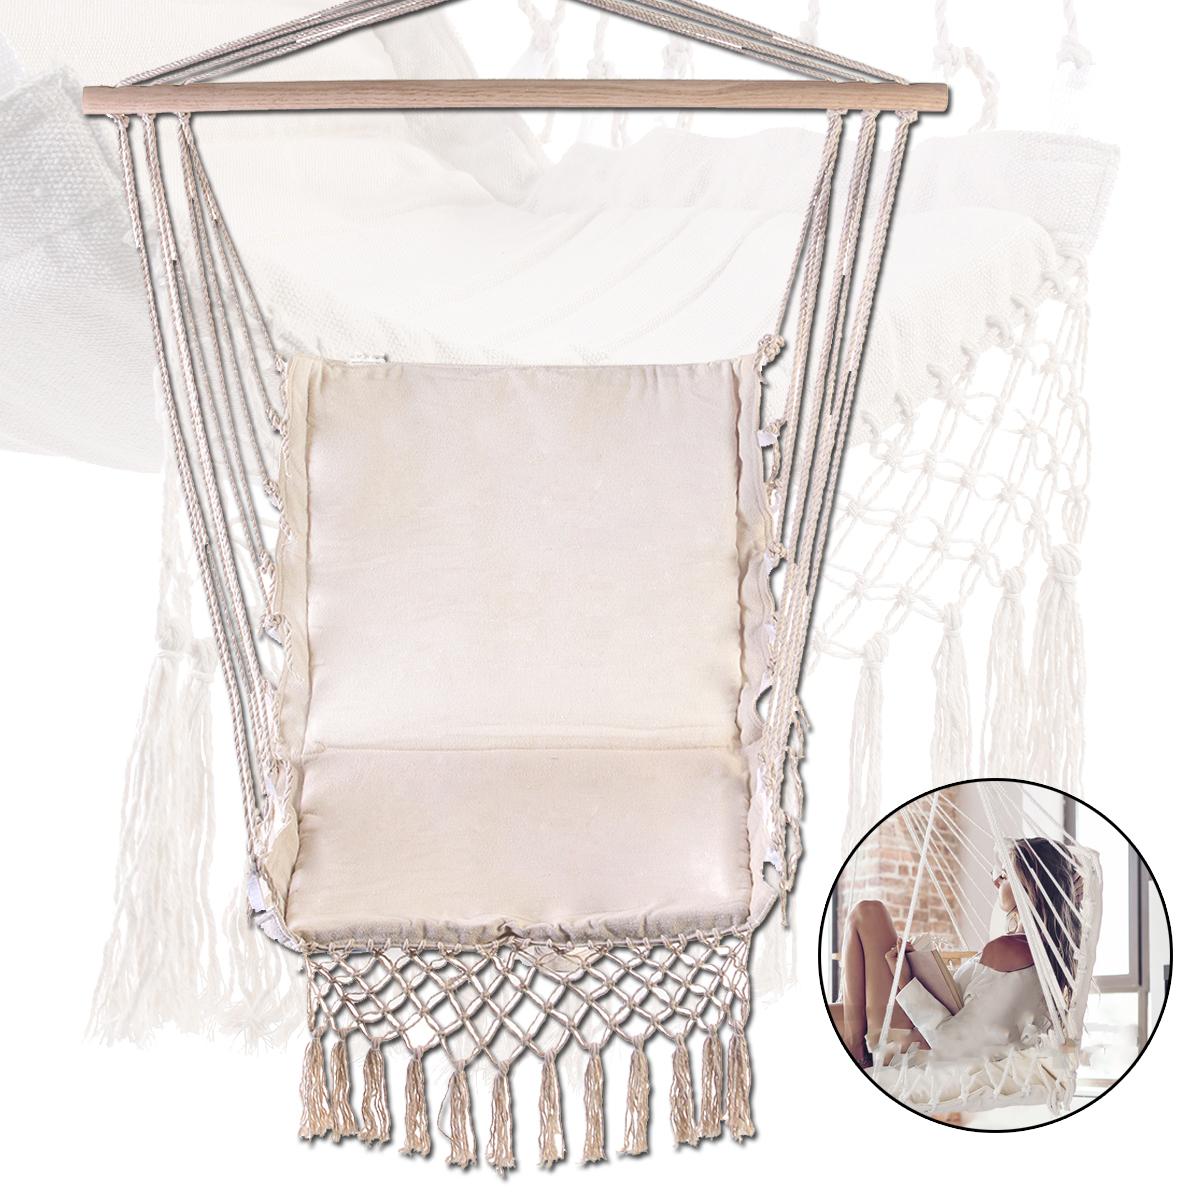 hanging chair home goods discounted office chairs 100x55cm deluxe hammock swing garden outdoor